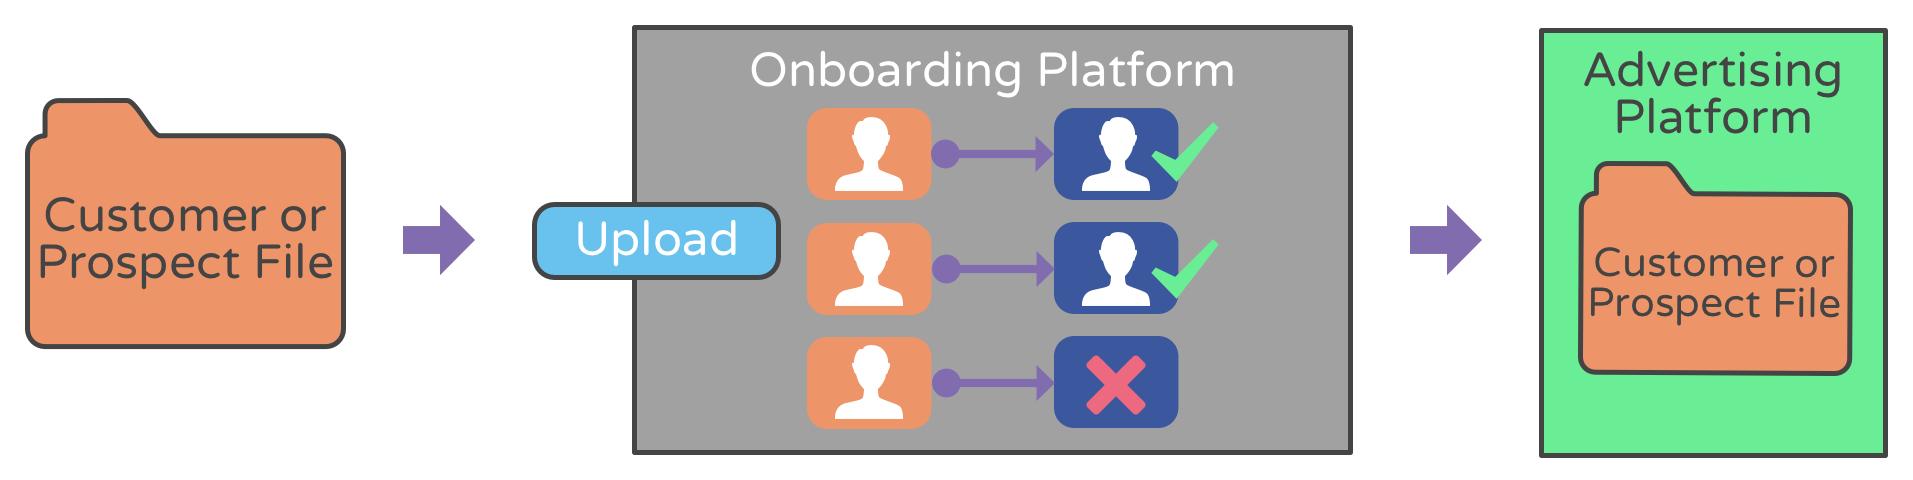 Onboarding+Process